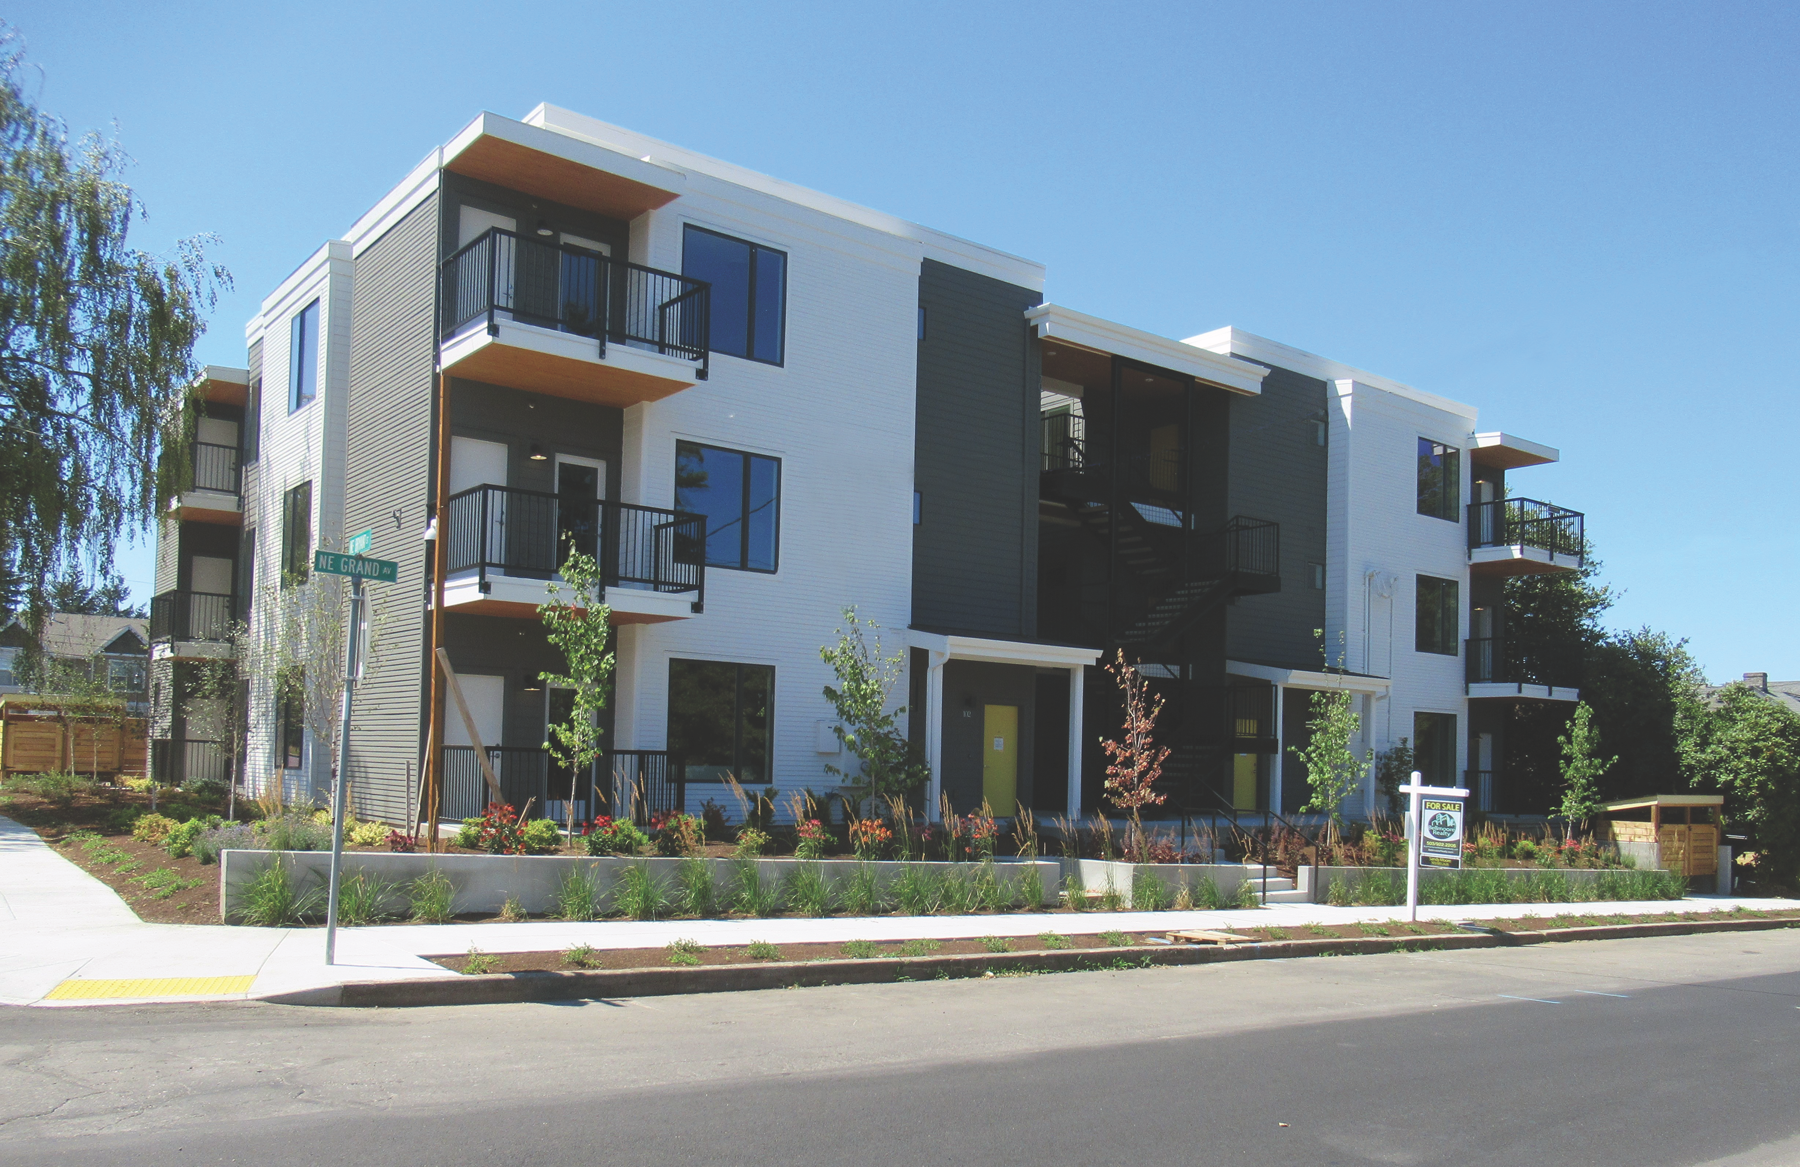 Bryant Apartments